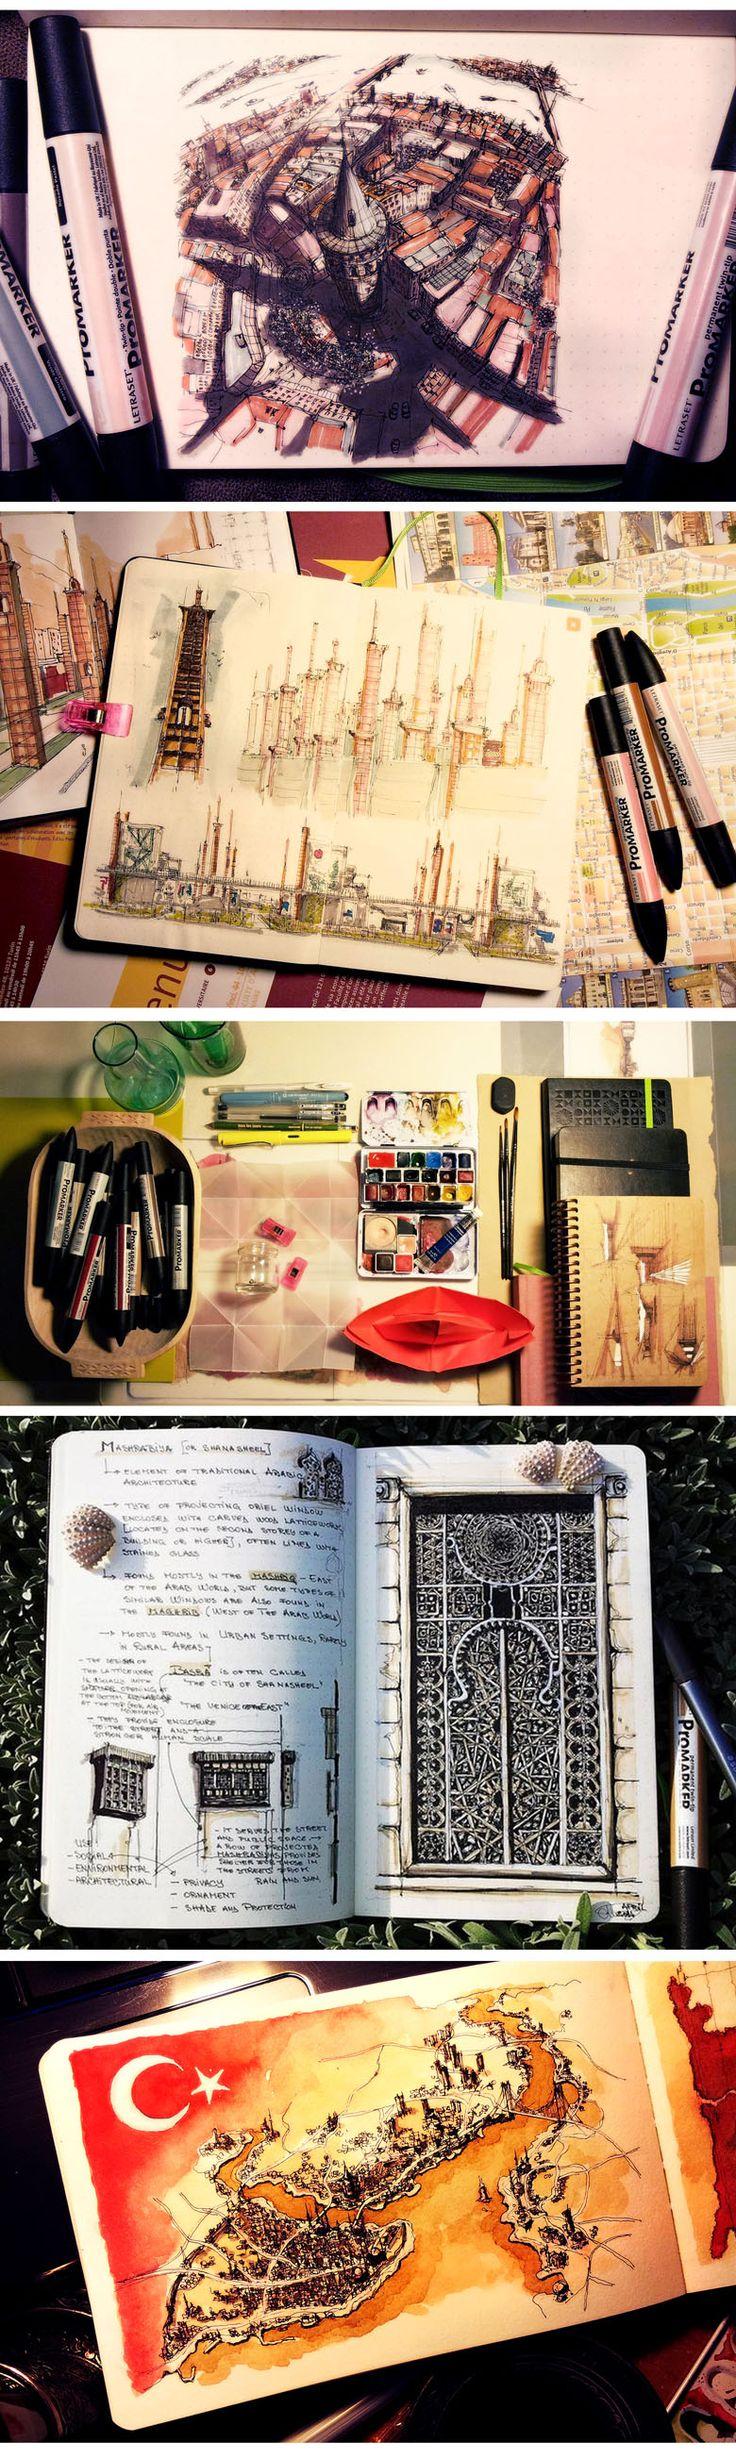 Loredana Micu #journal #urban #sketch #moleskine https://www.behance.net/LoredanaMicu